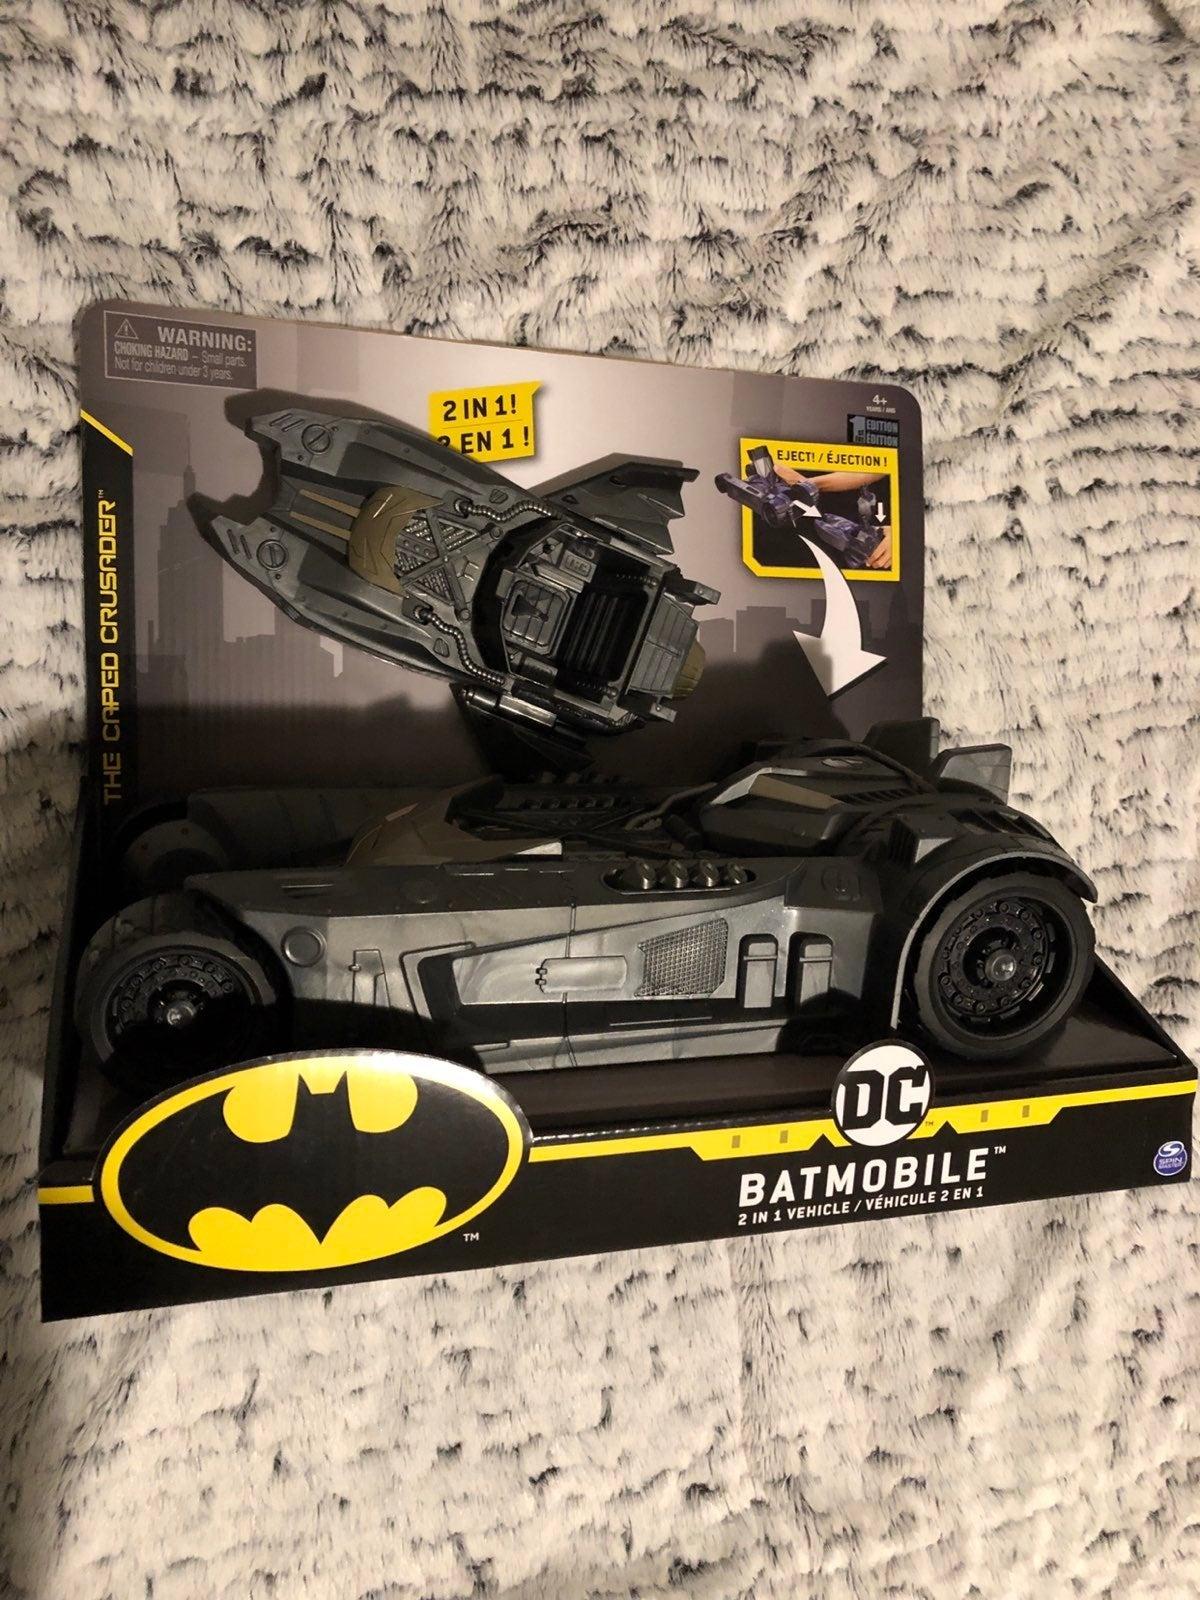 New Batmobile 2 in 1 vehicle